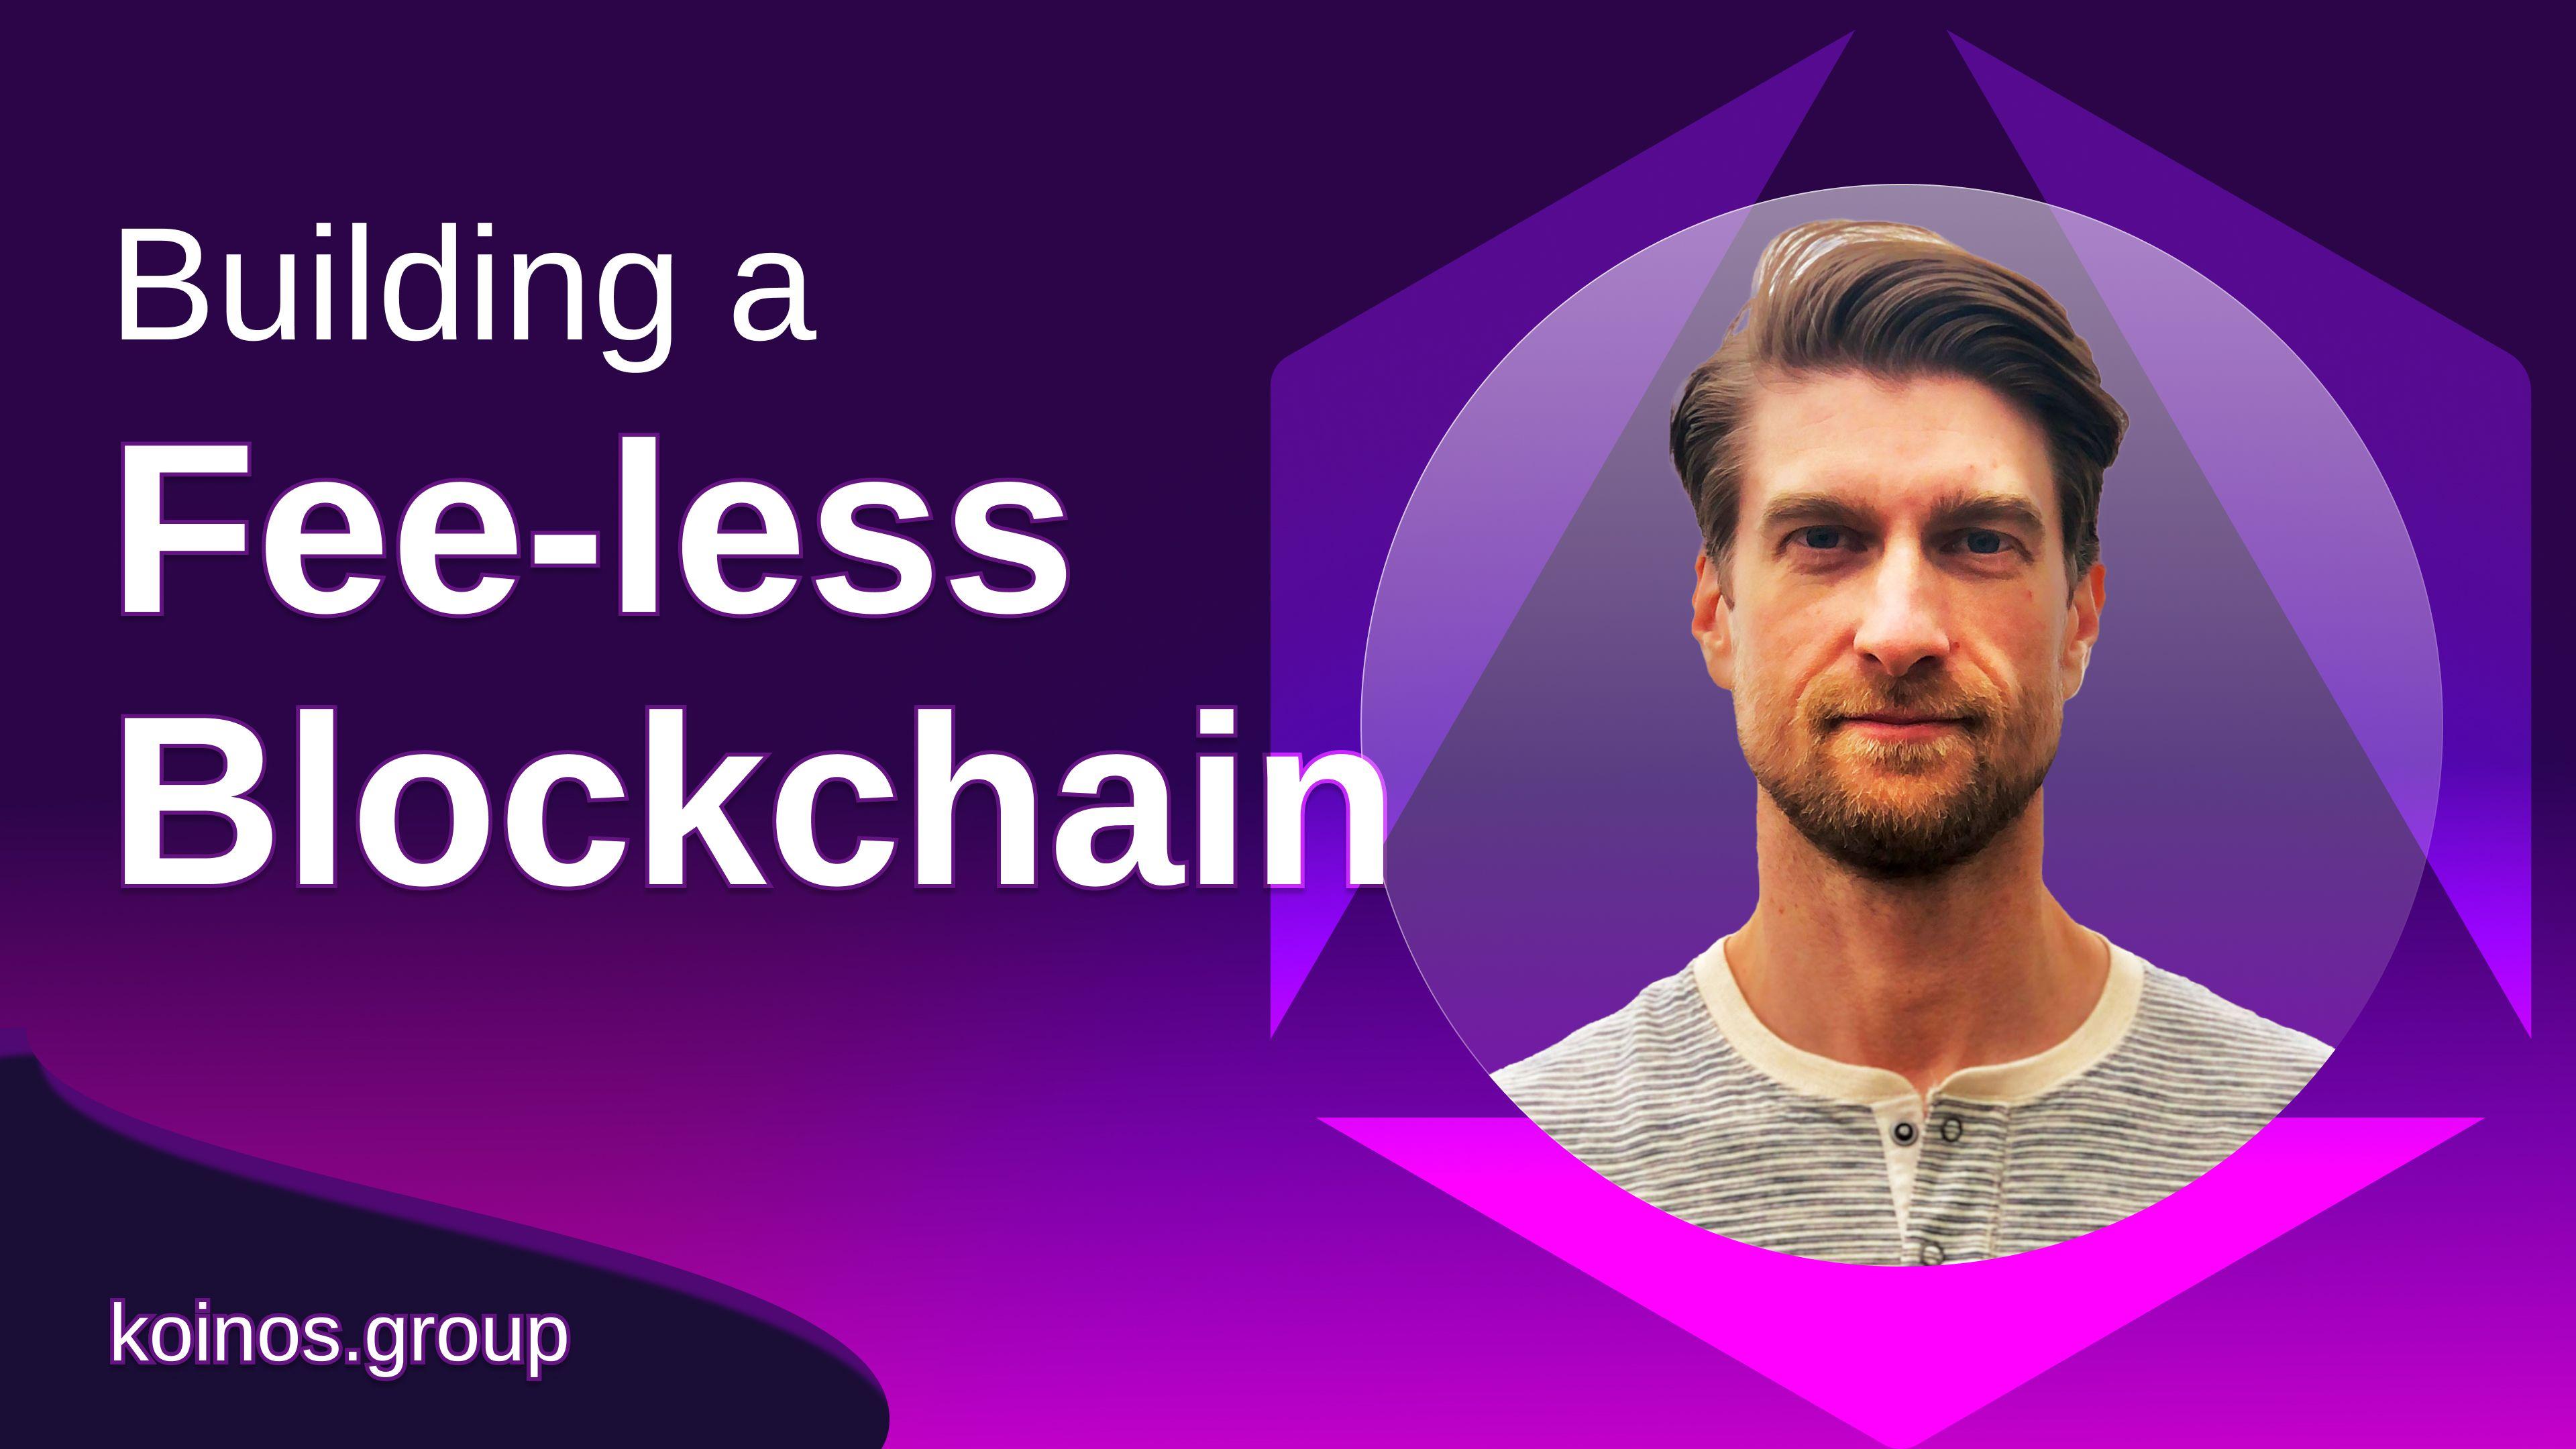 <bold>How</bold> We're <bold>Building</bold> a Fee-less <bold>Blockchain</bold>